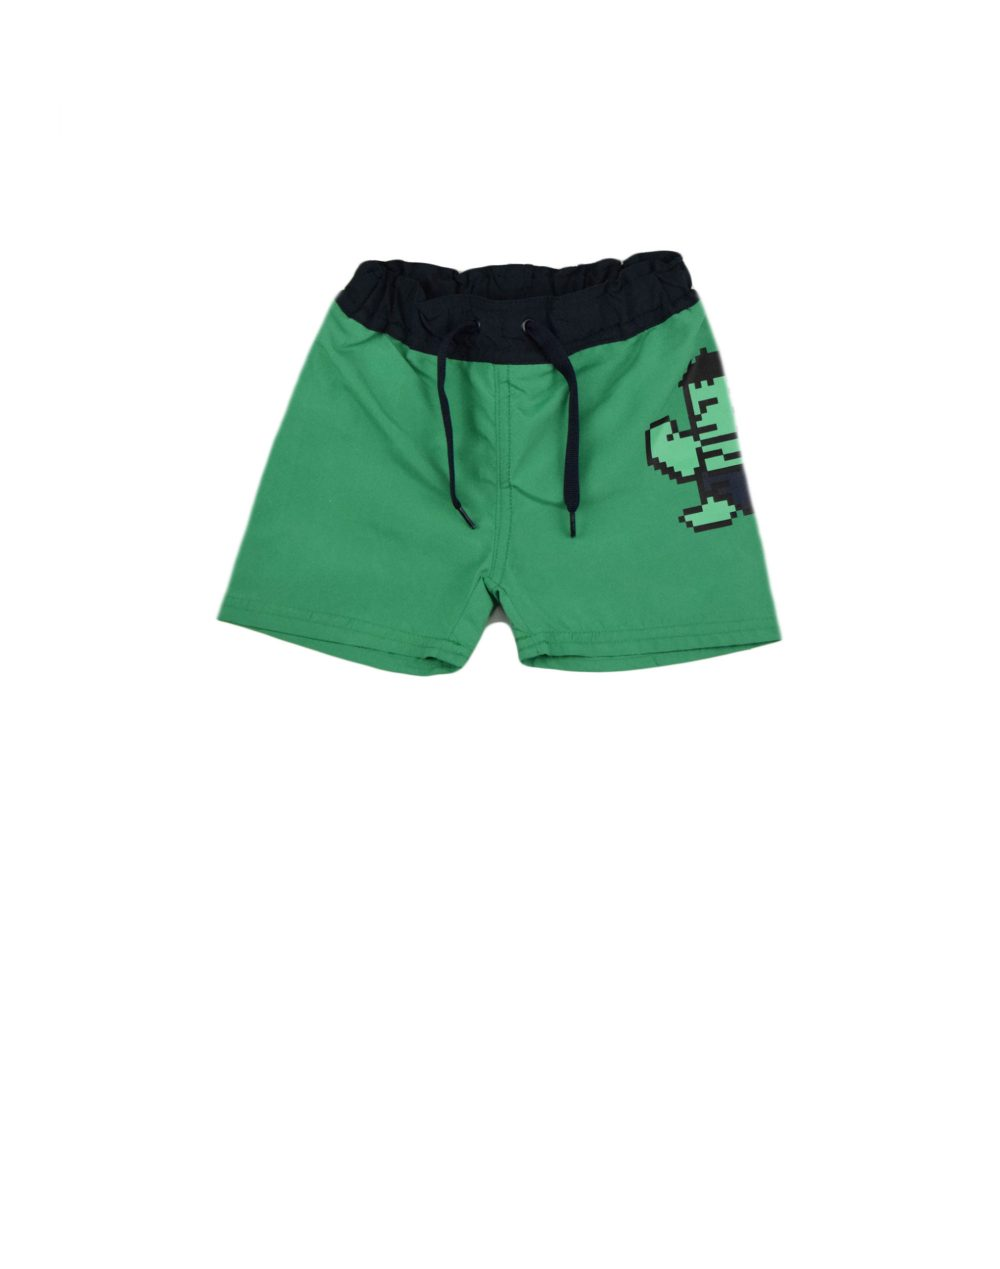 Name It Avengers Arrow Long Shorts (13174832) Leprechaun